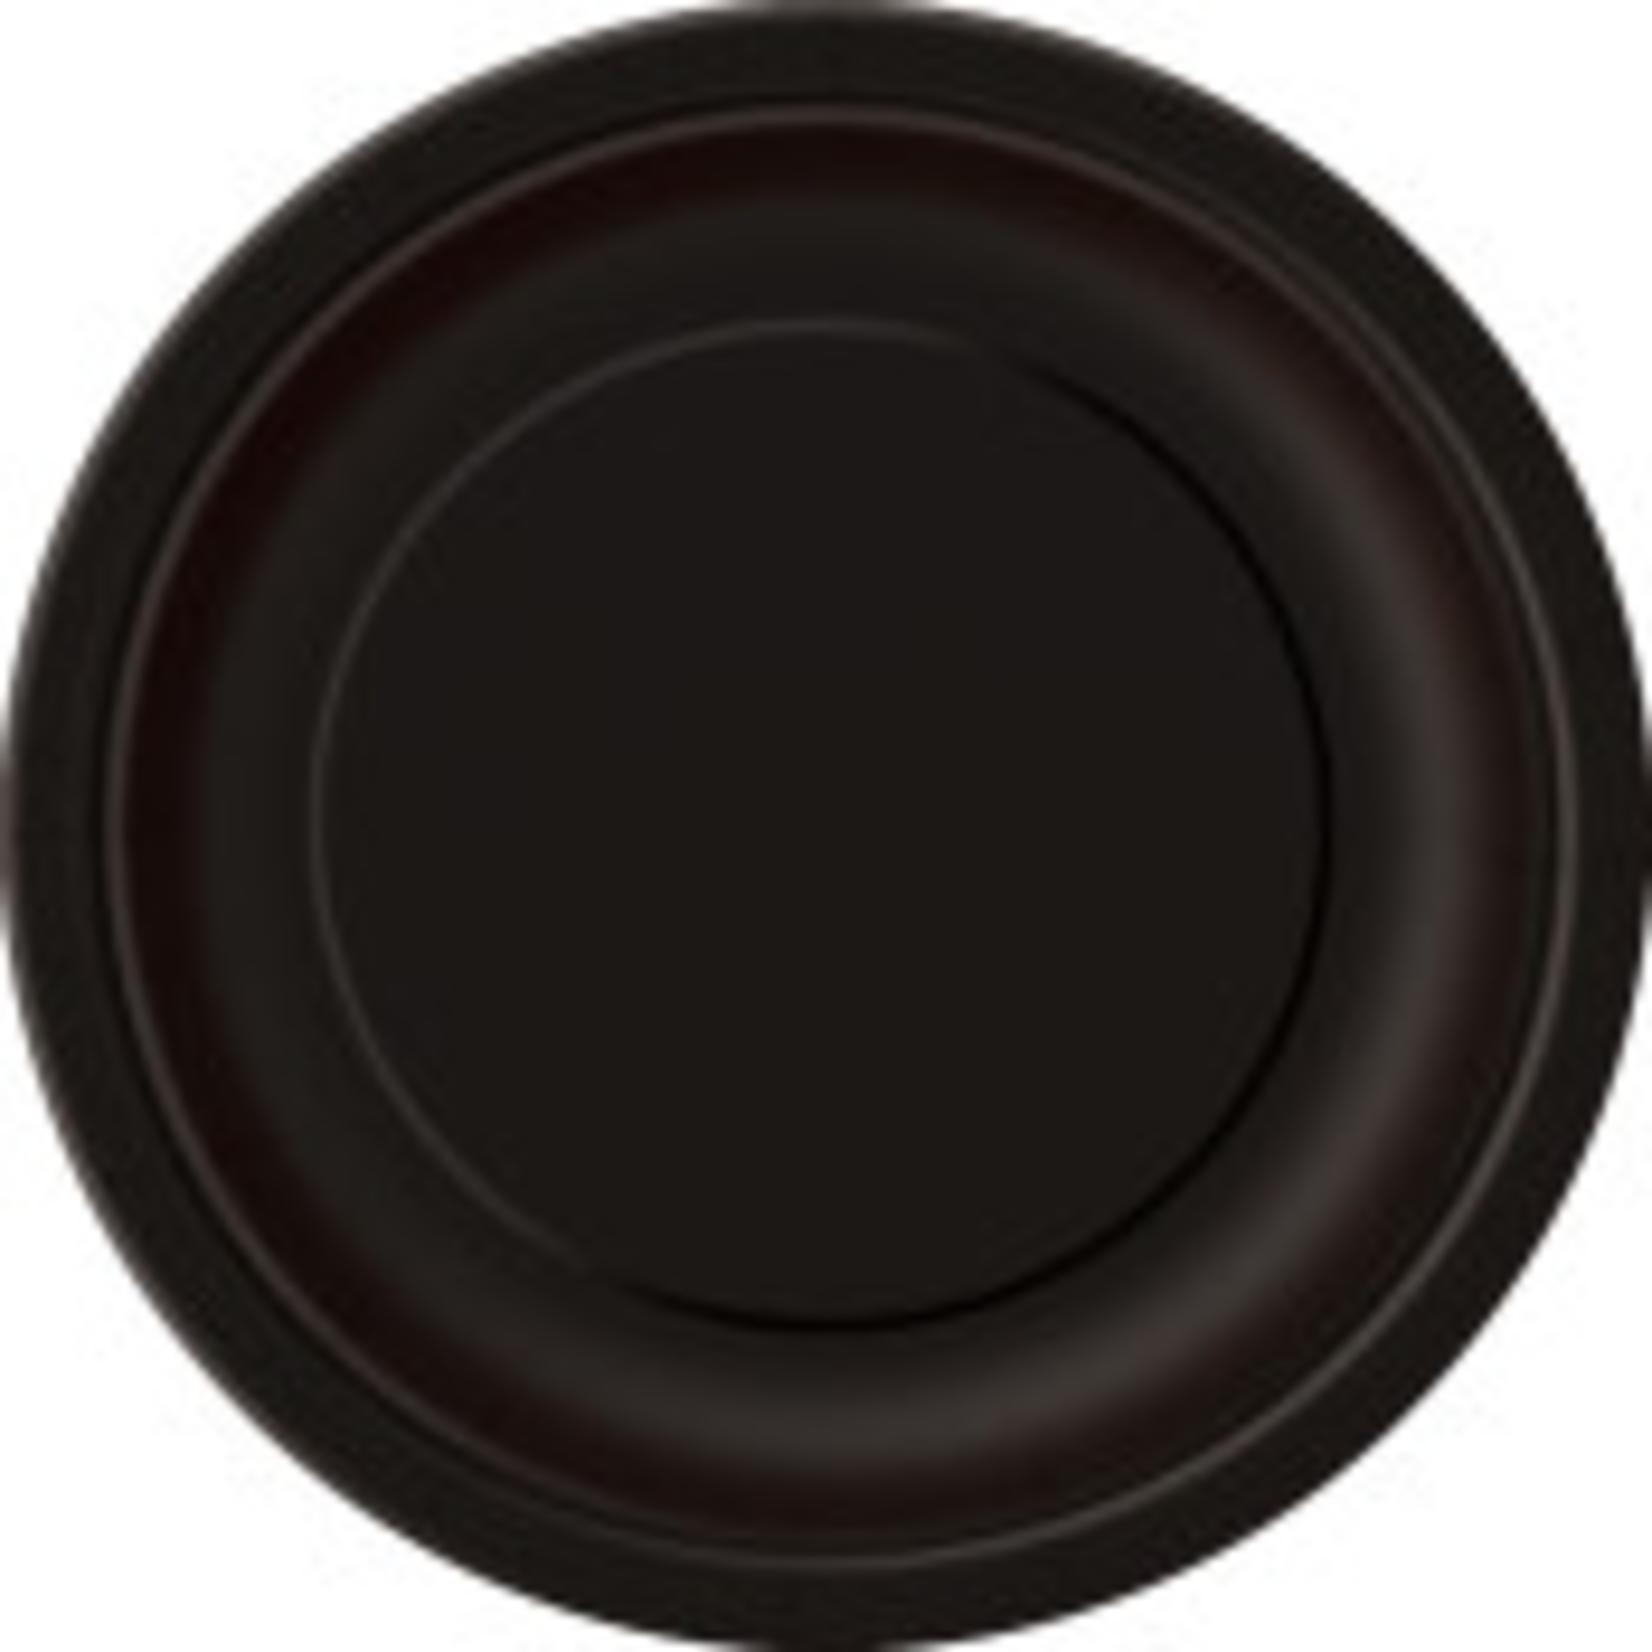 "20PCS  7"" Round Plates MIDNIGHT BLACK SOLID"